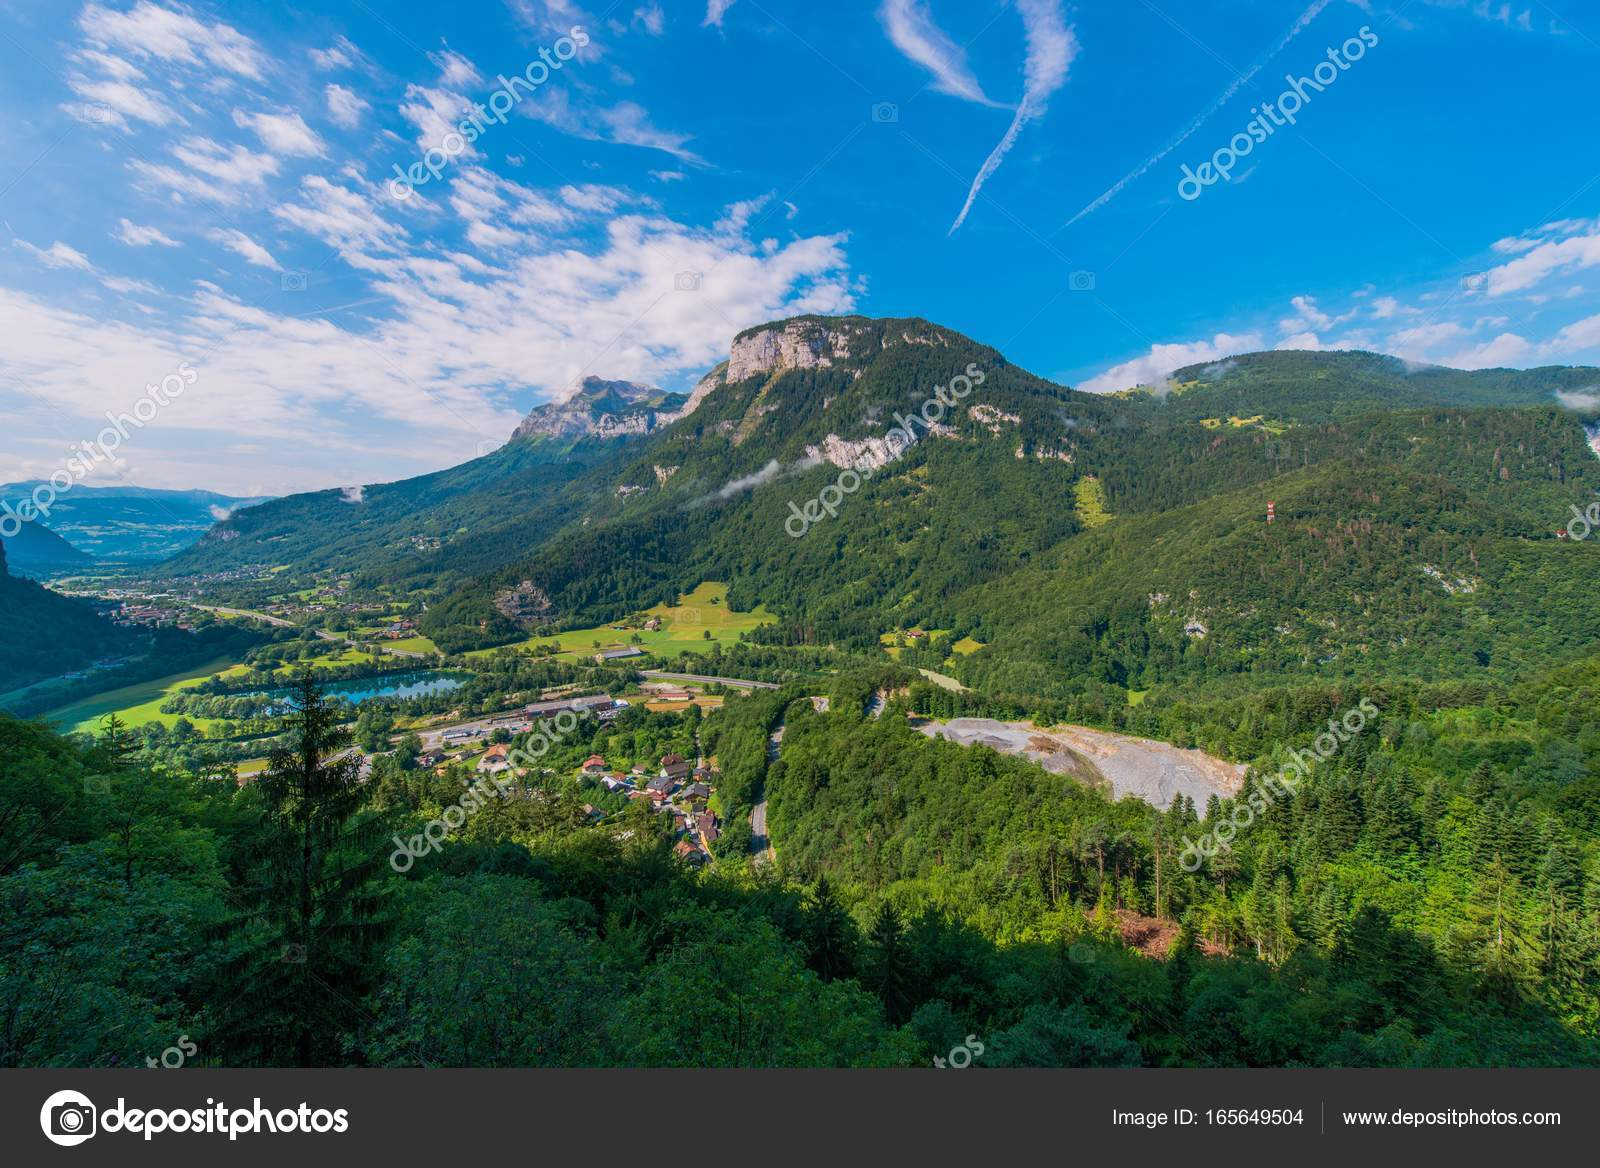 Auvergne rhone alpes region stock photo welcomia 165649504 auvergne rhone alpes region stock photo thecheapjerseys Image collections